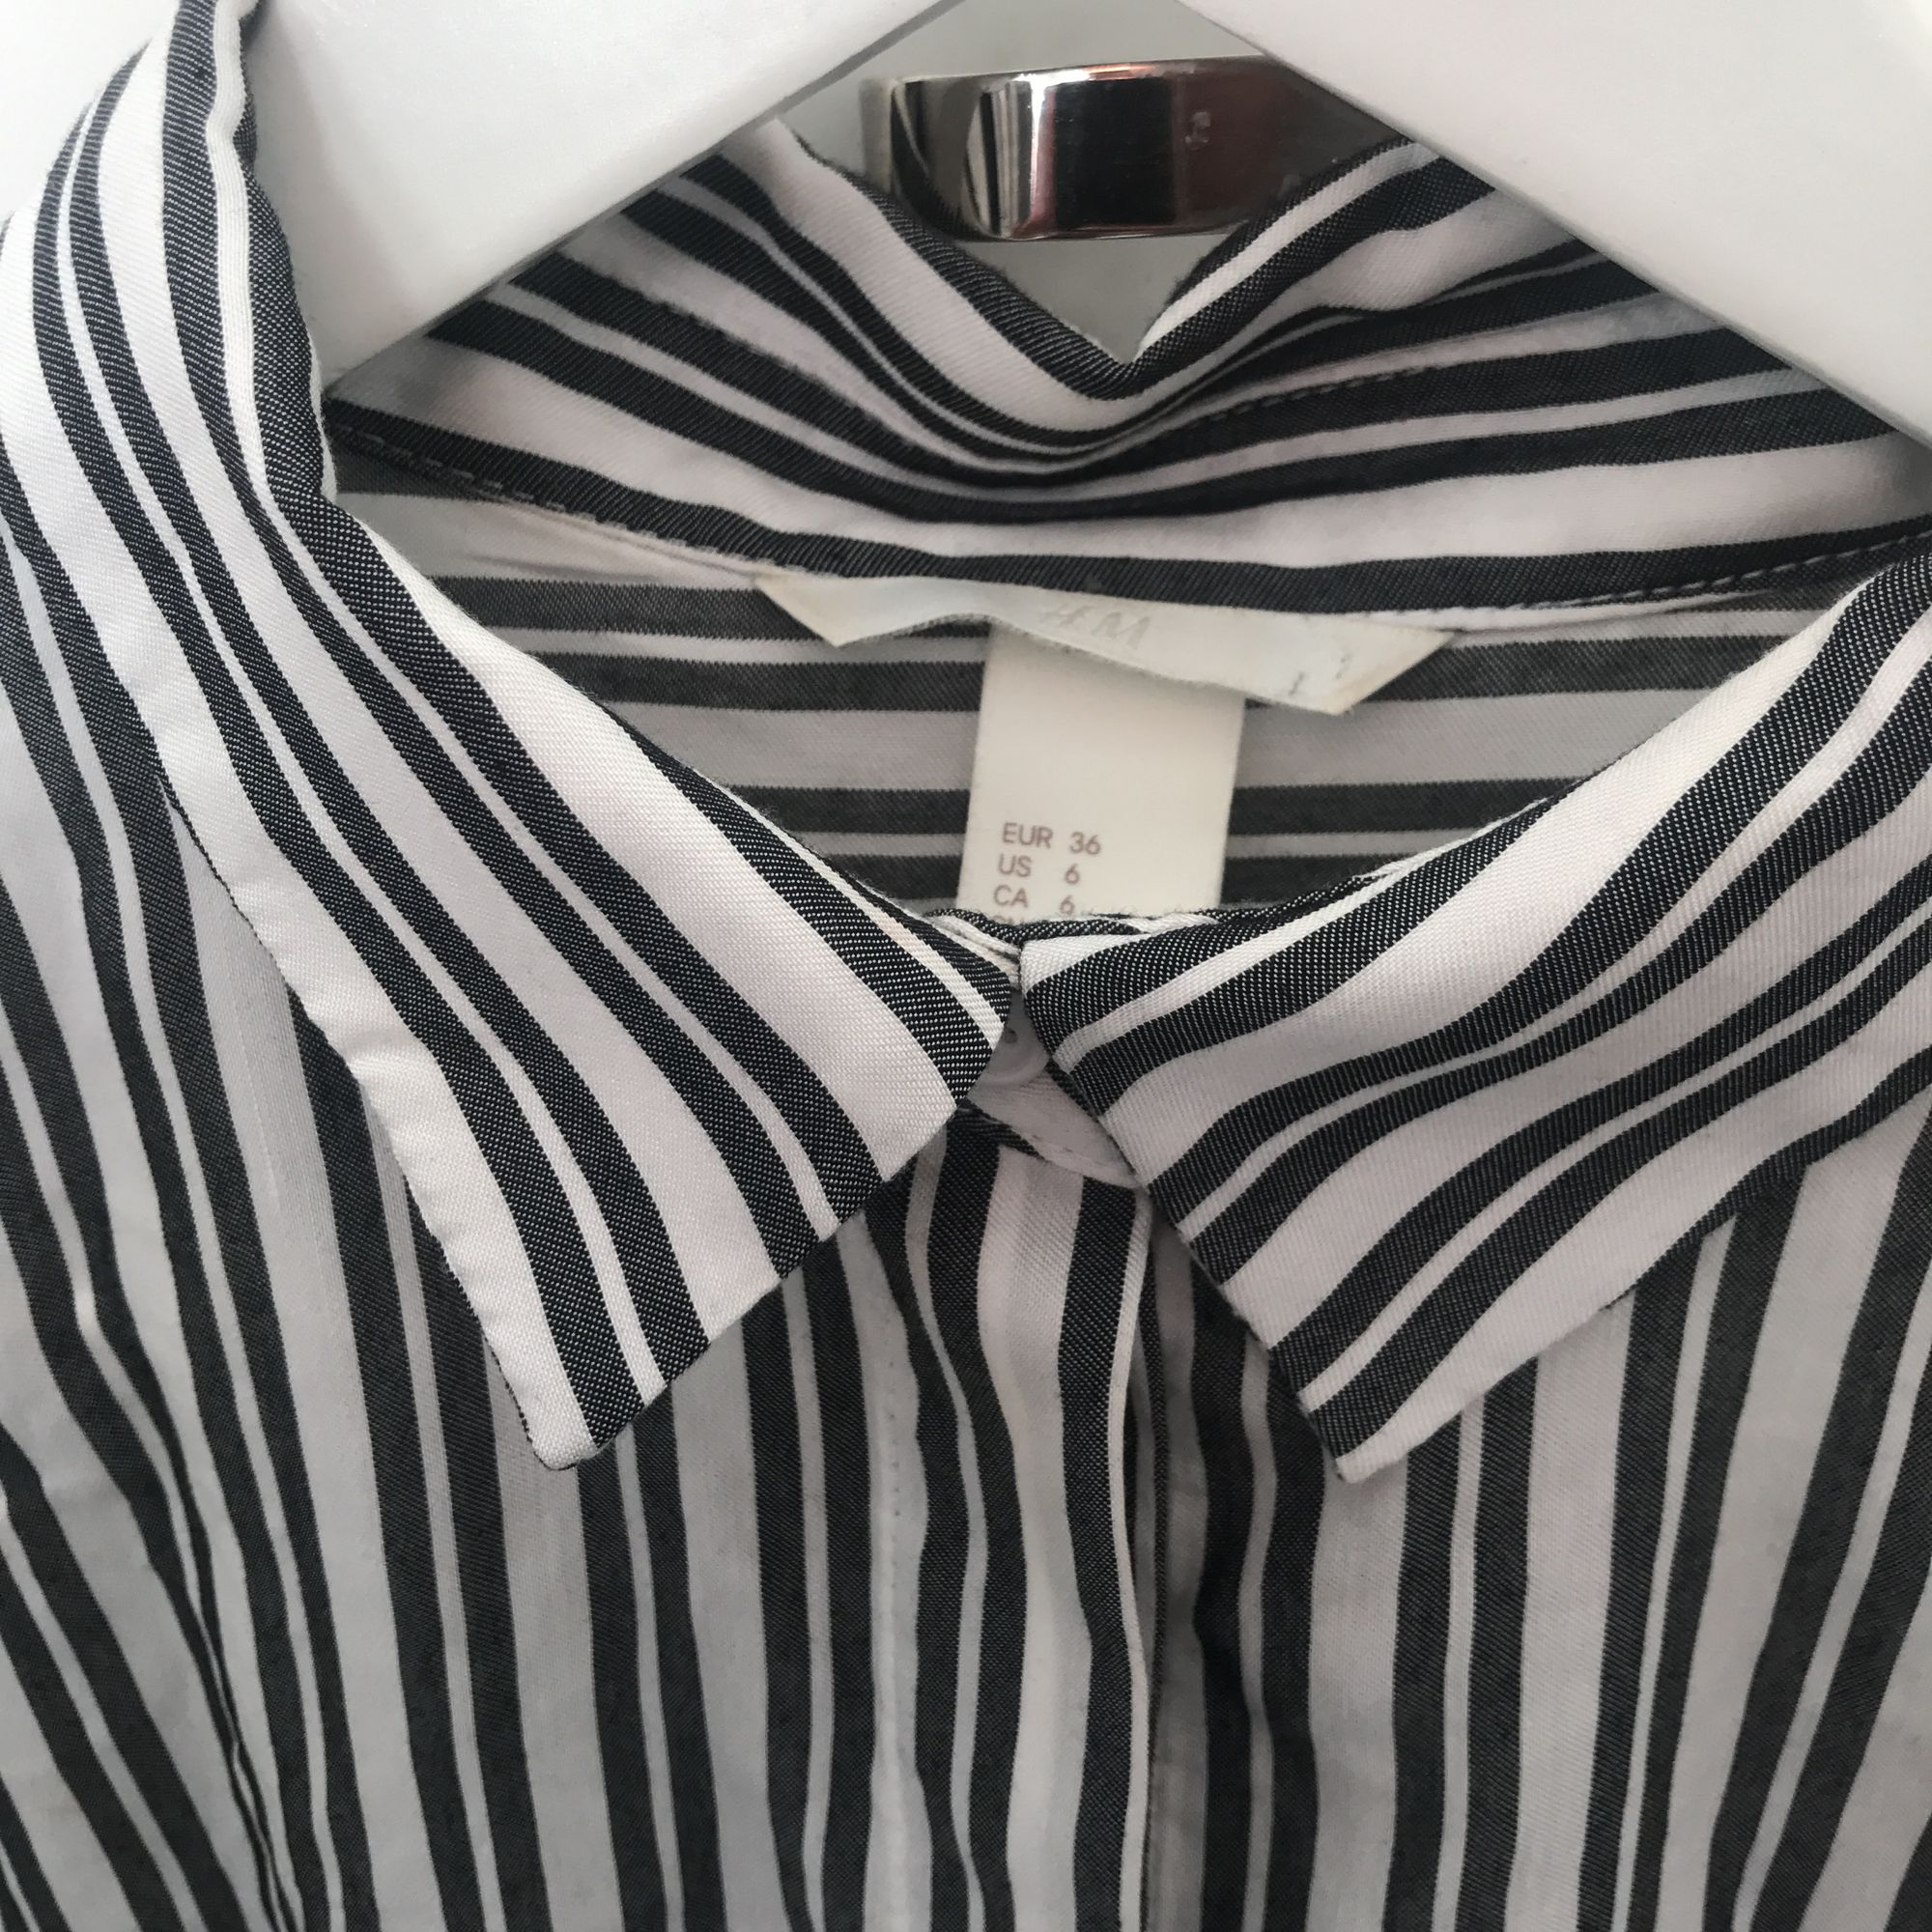 Randig skjorta fint skick. Frakt 39kr postnord. Skjortor.